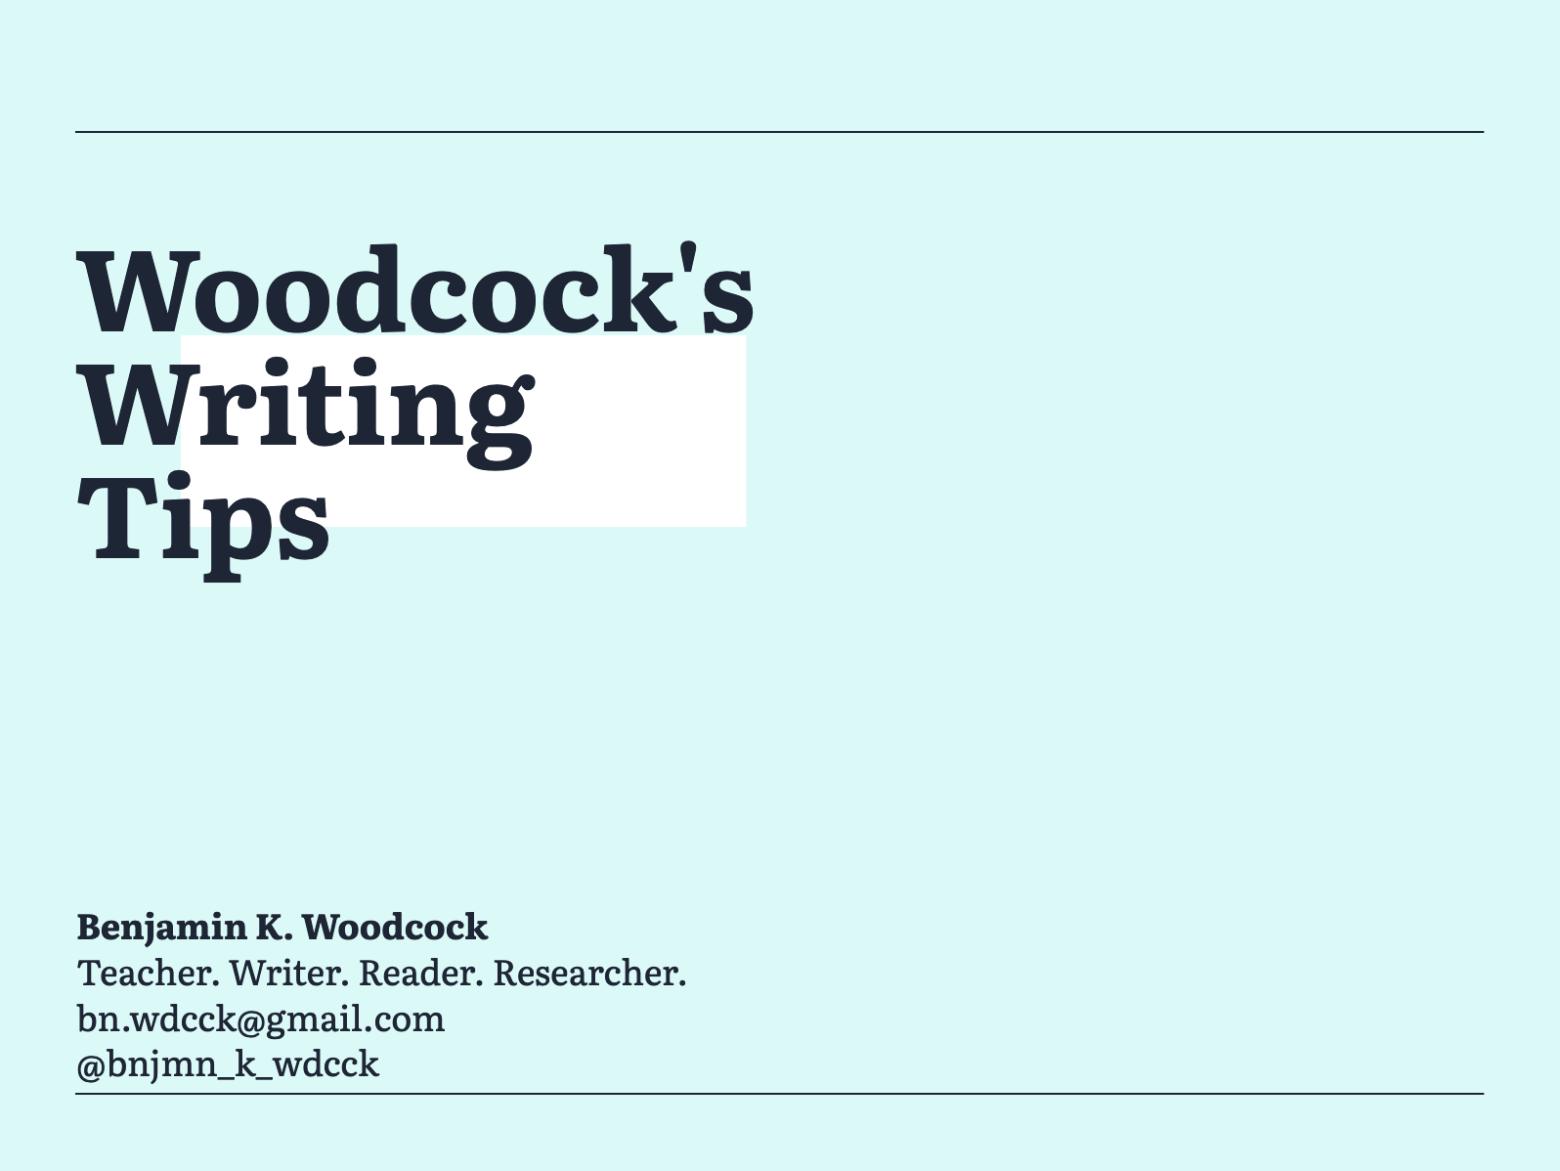 Woodcock's Writing Tips – Formatting Titles